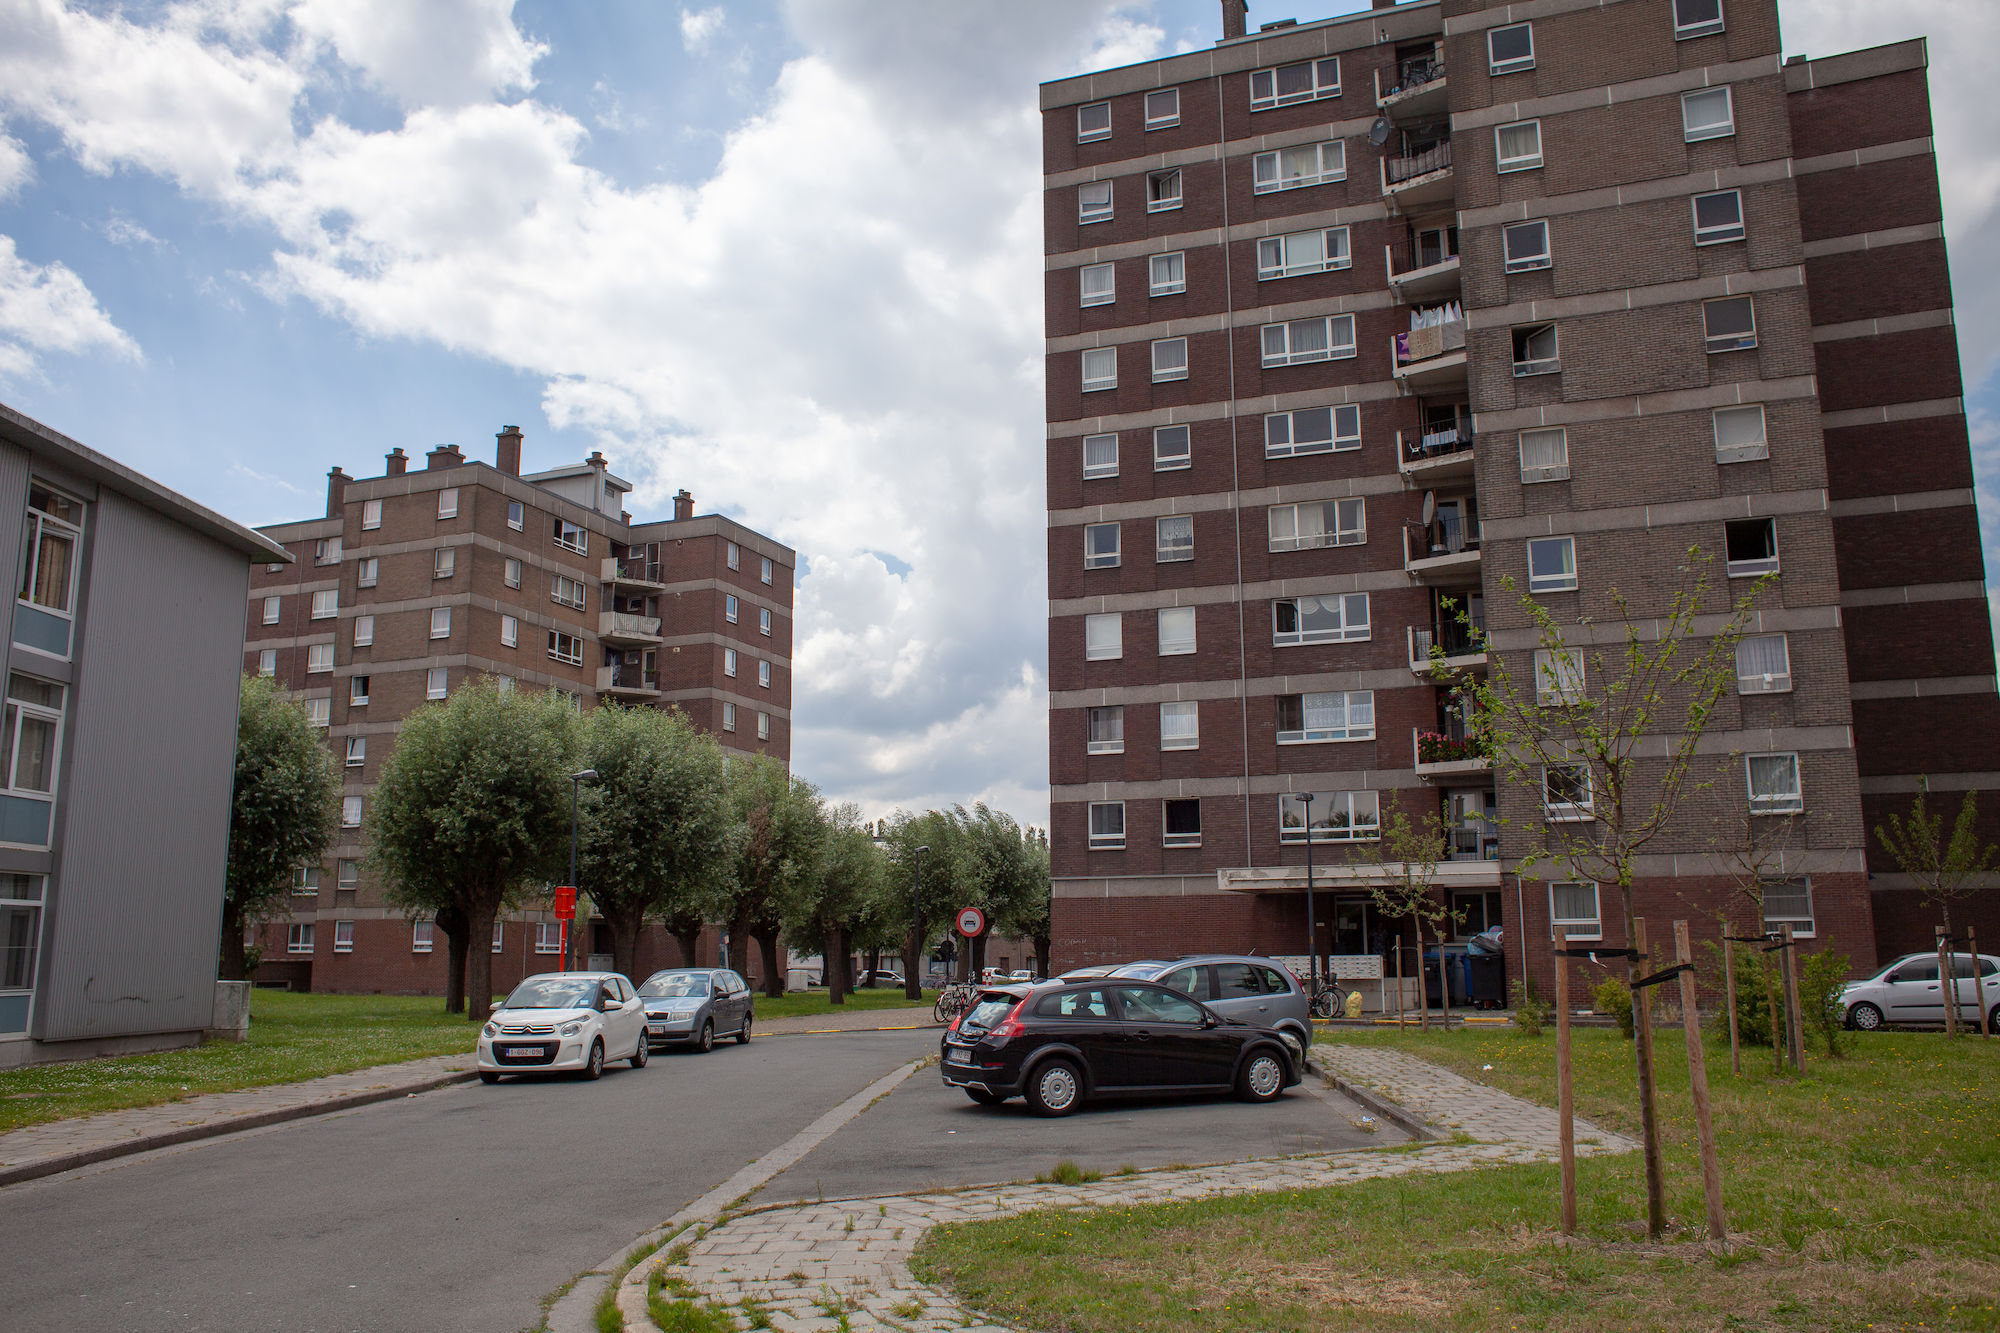 2019-07-02 Muide Meulestede prospectie Wannes_stadsvernieuwing_IMG_0351-3.jpg